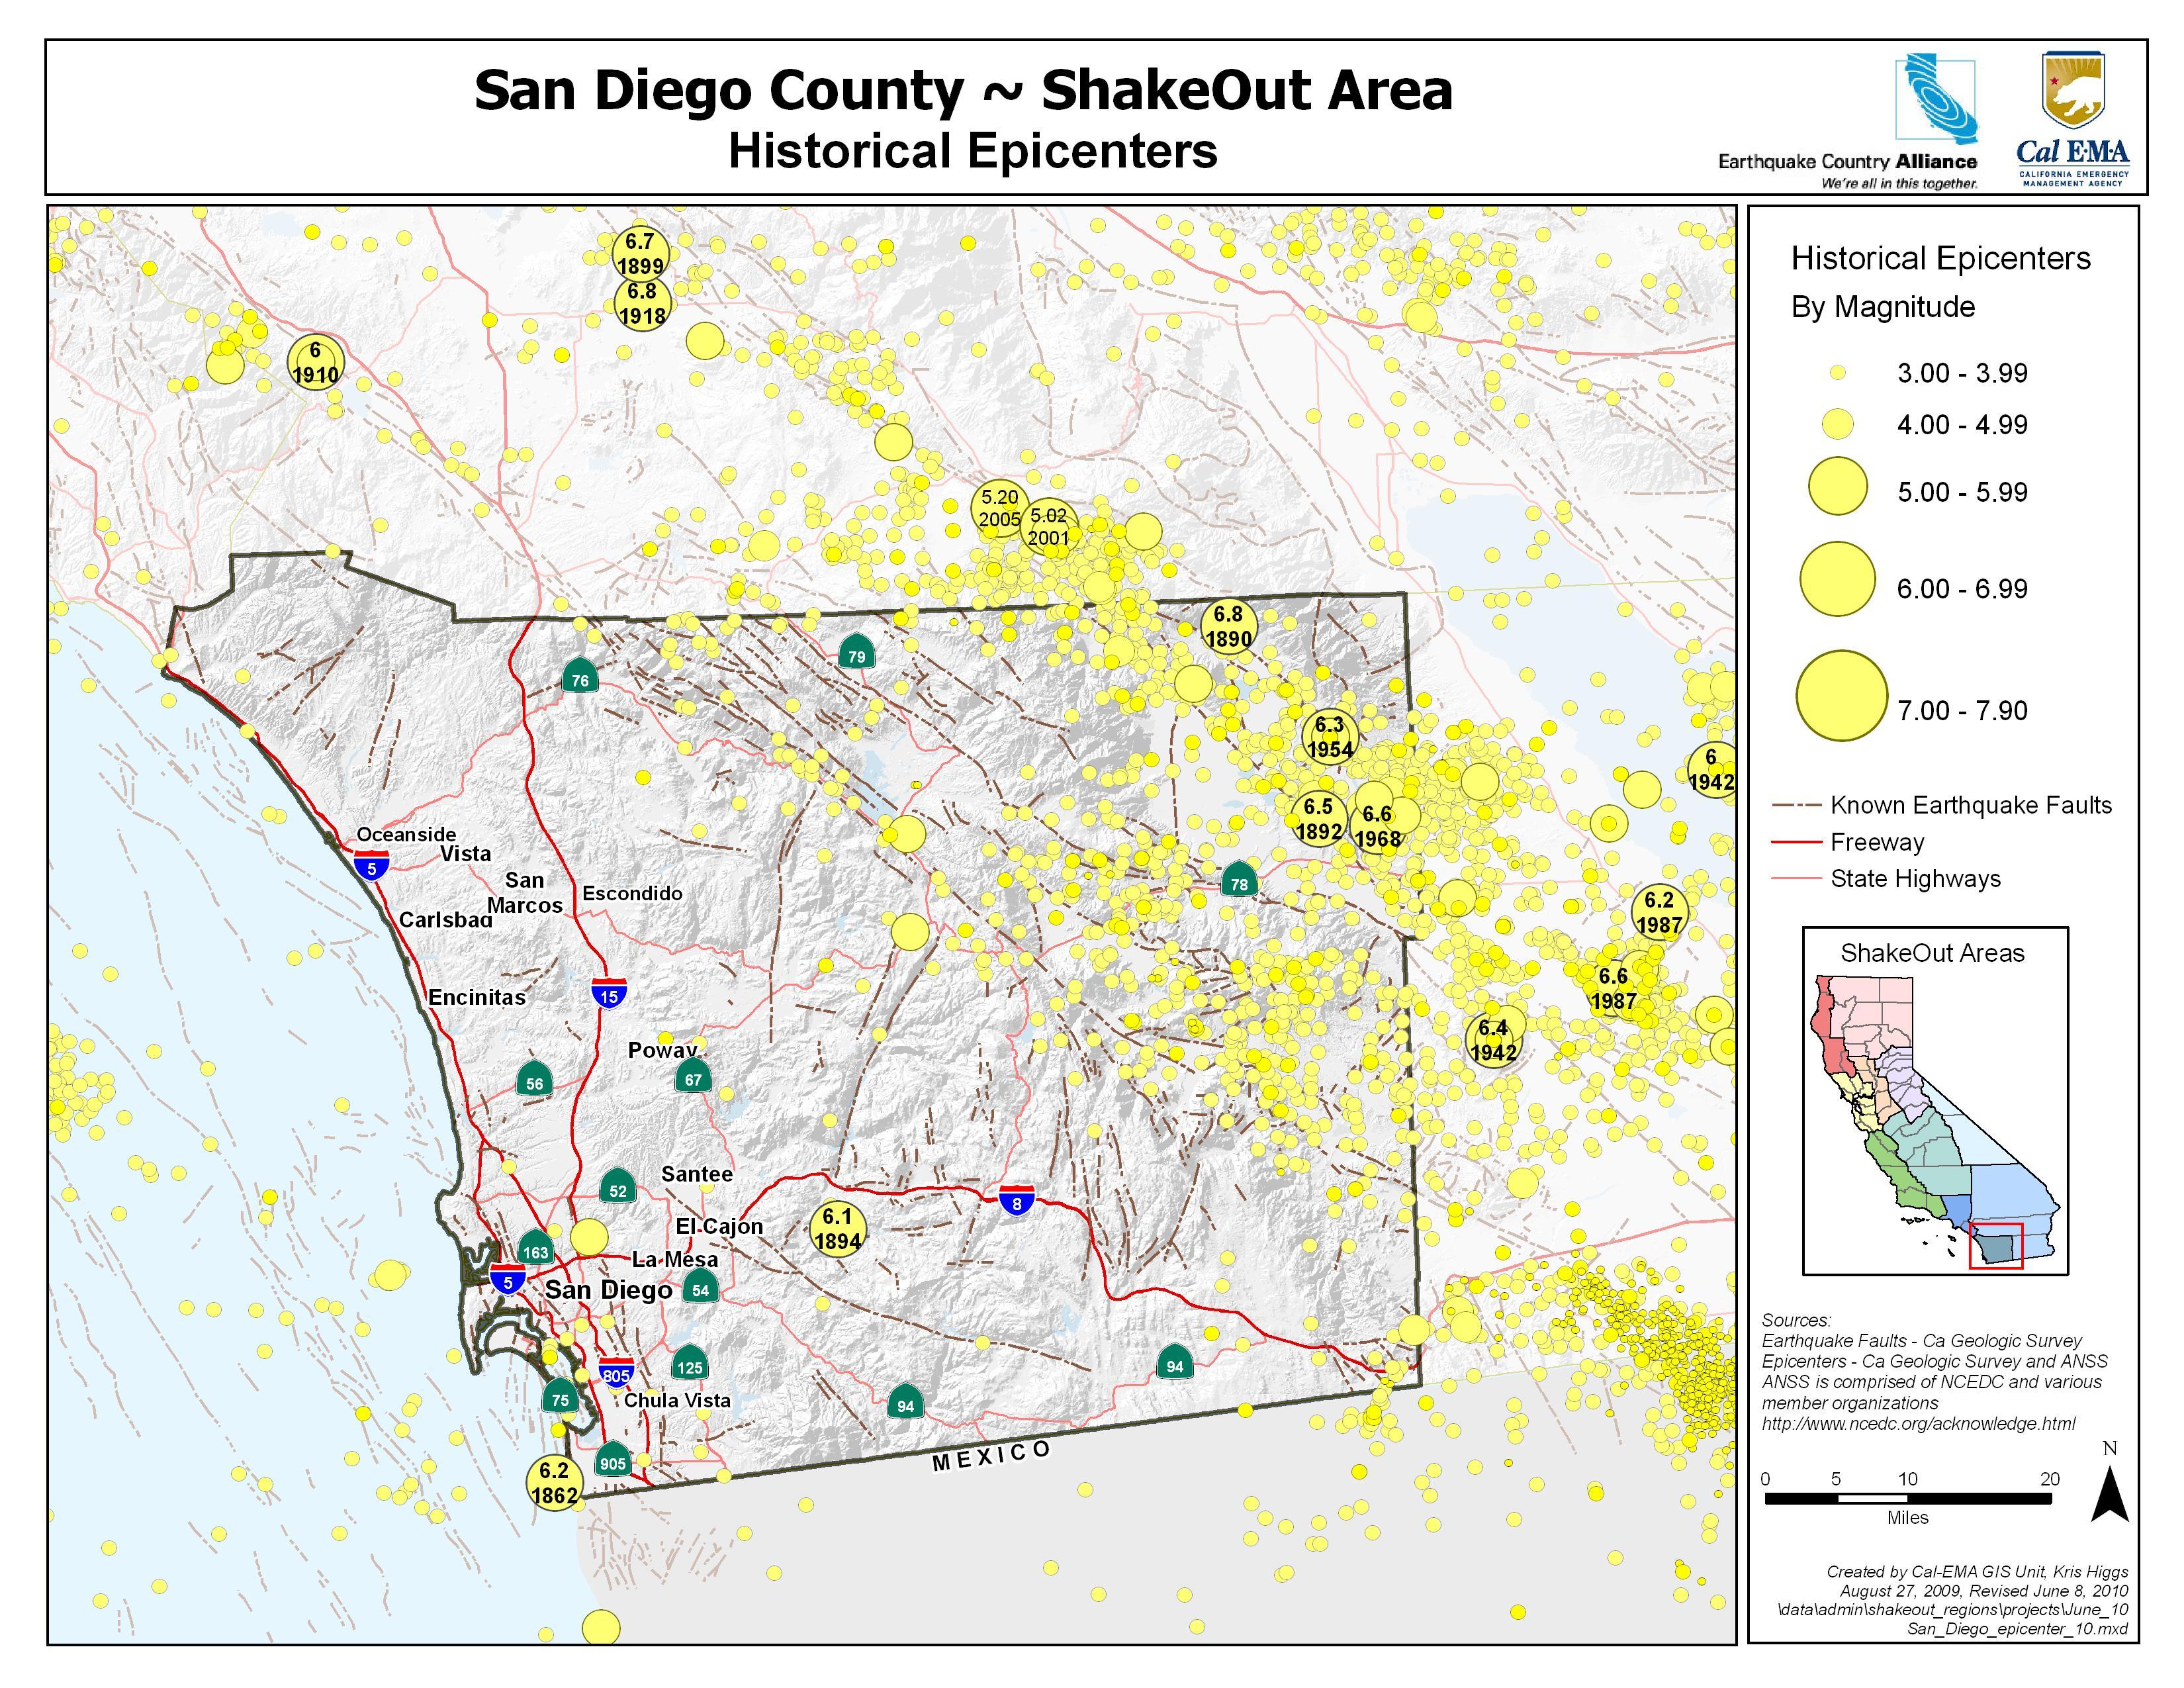 The Great California Shakeout - San Diego County Earthquake Hazards - Earthquake California Index Map